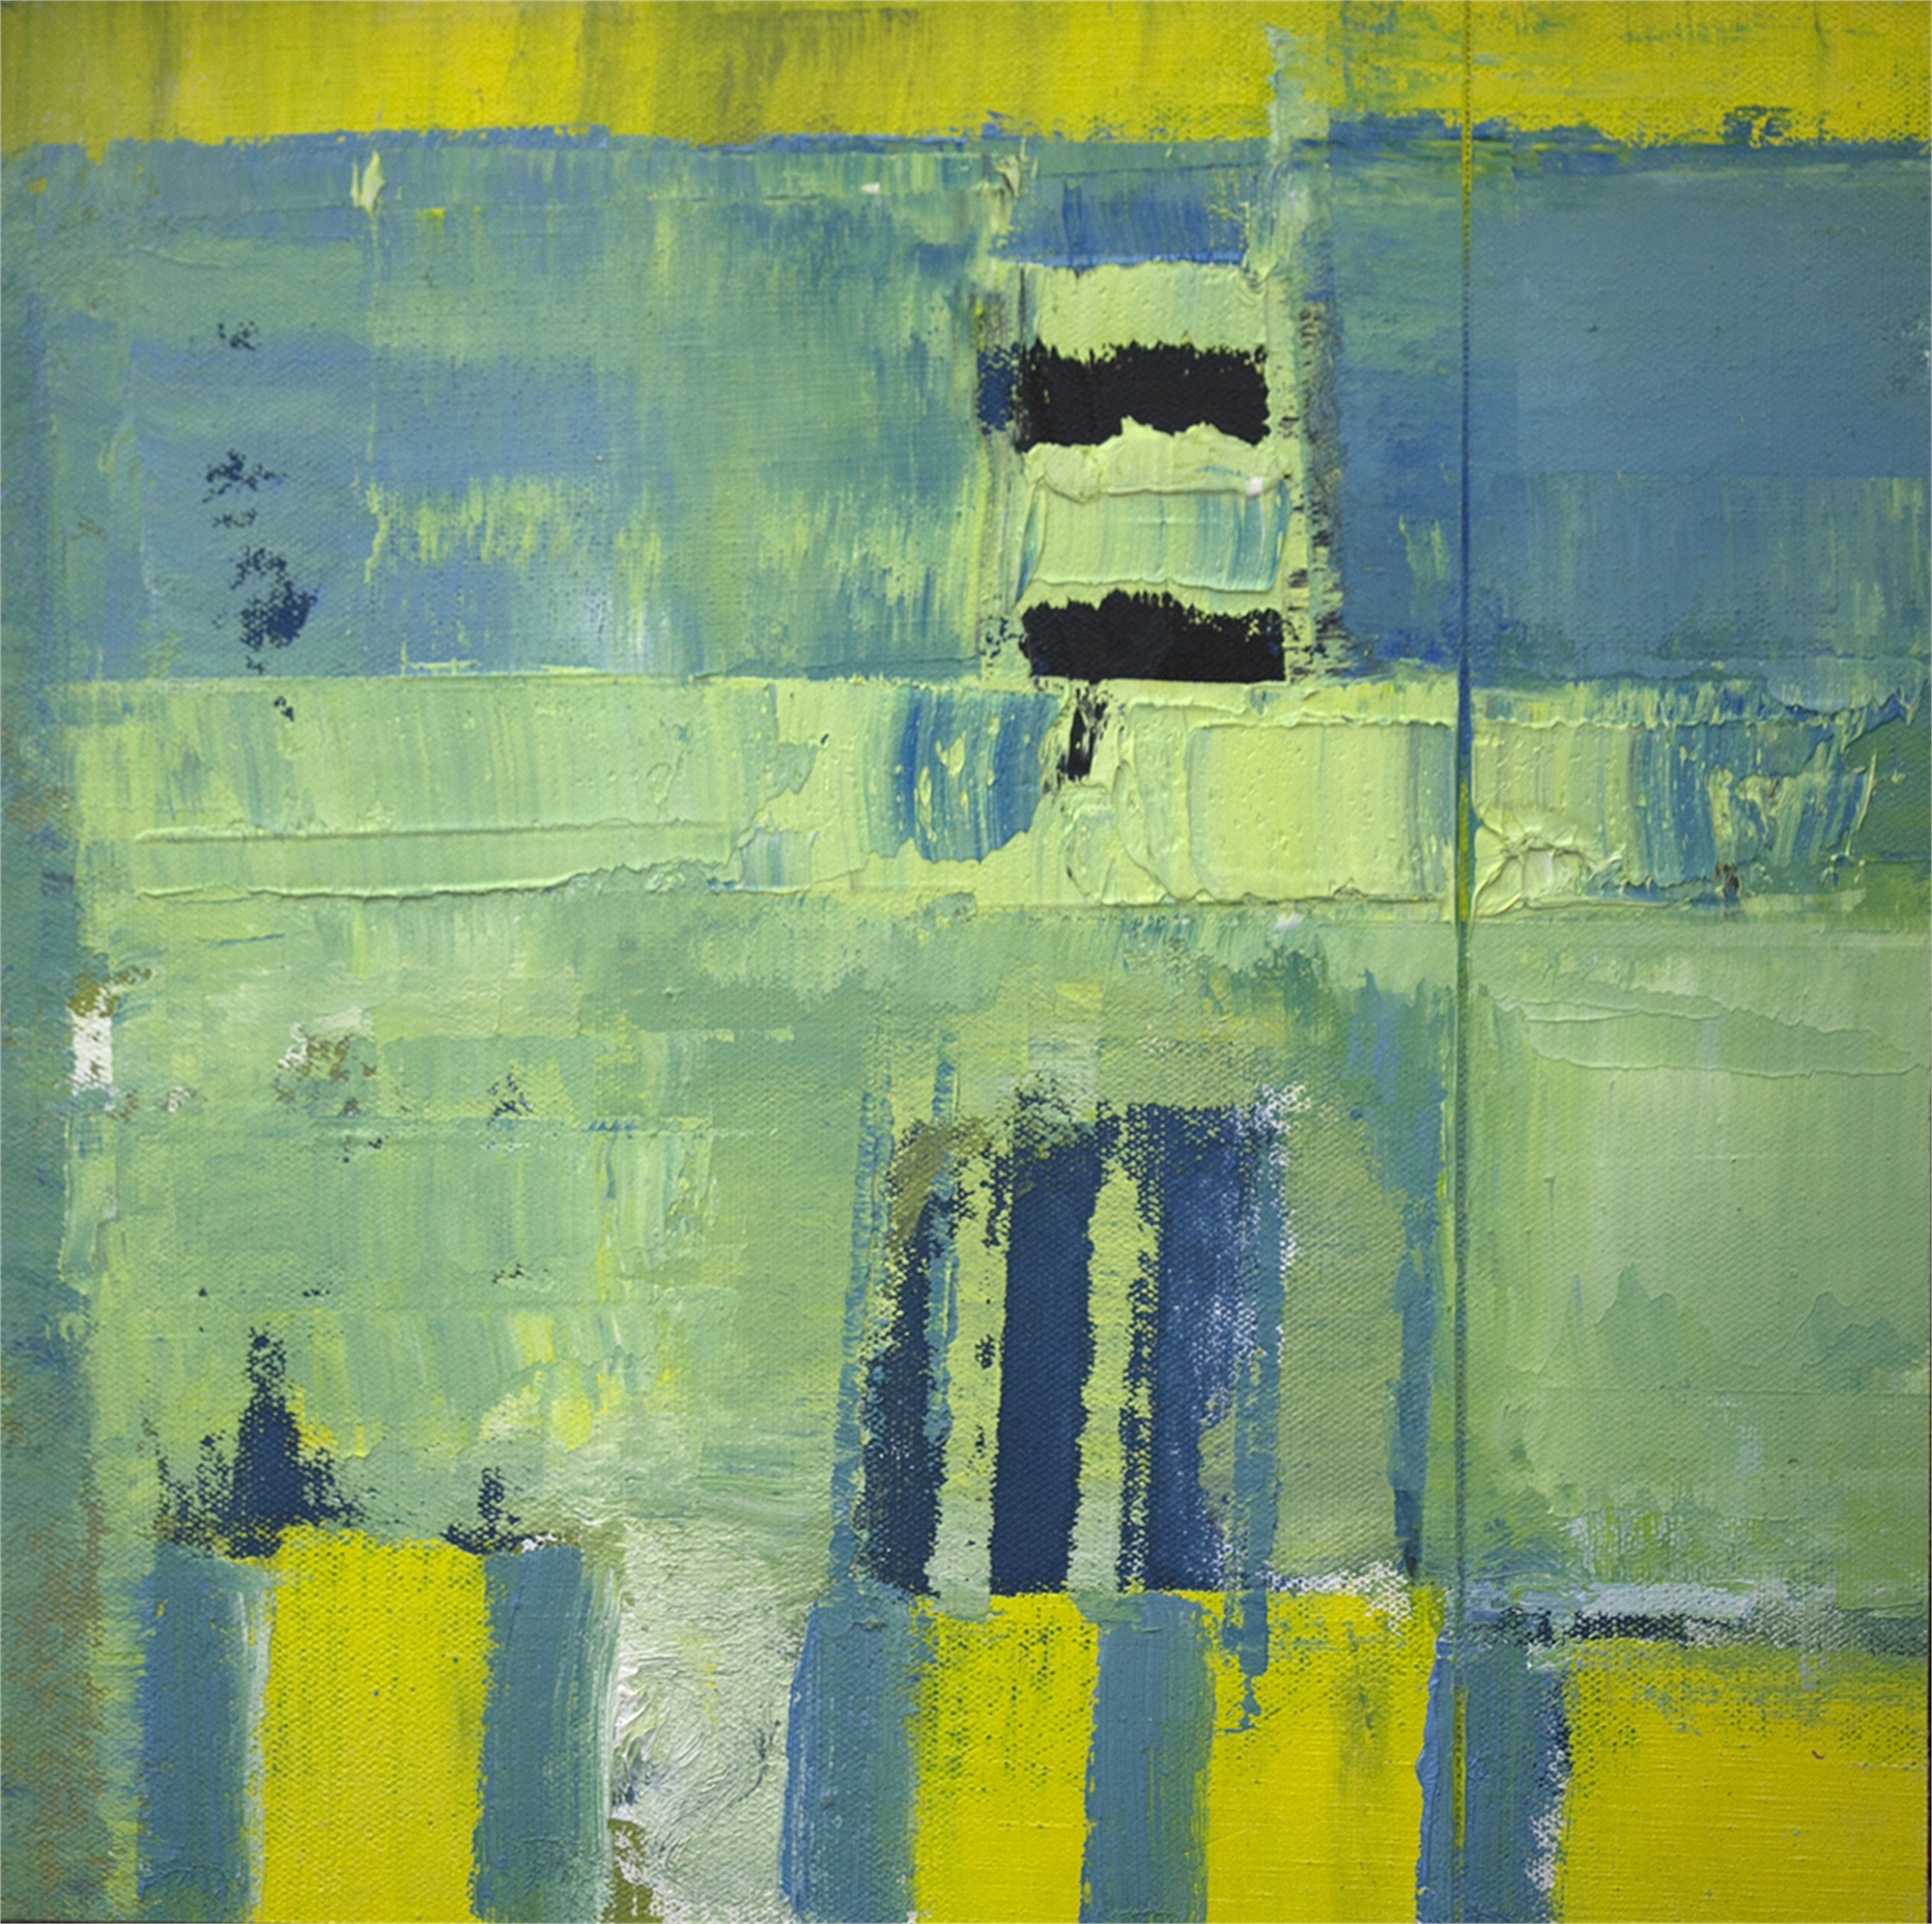 Radiant by John McCaw